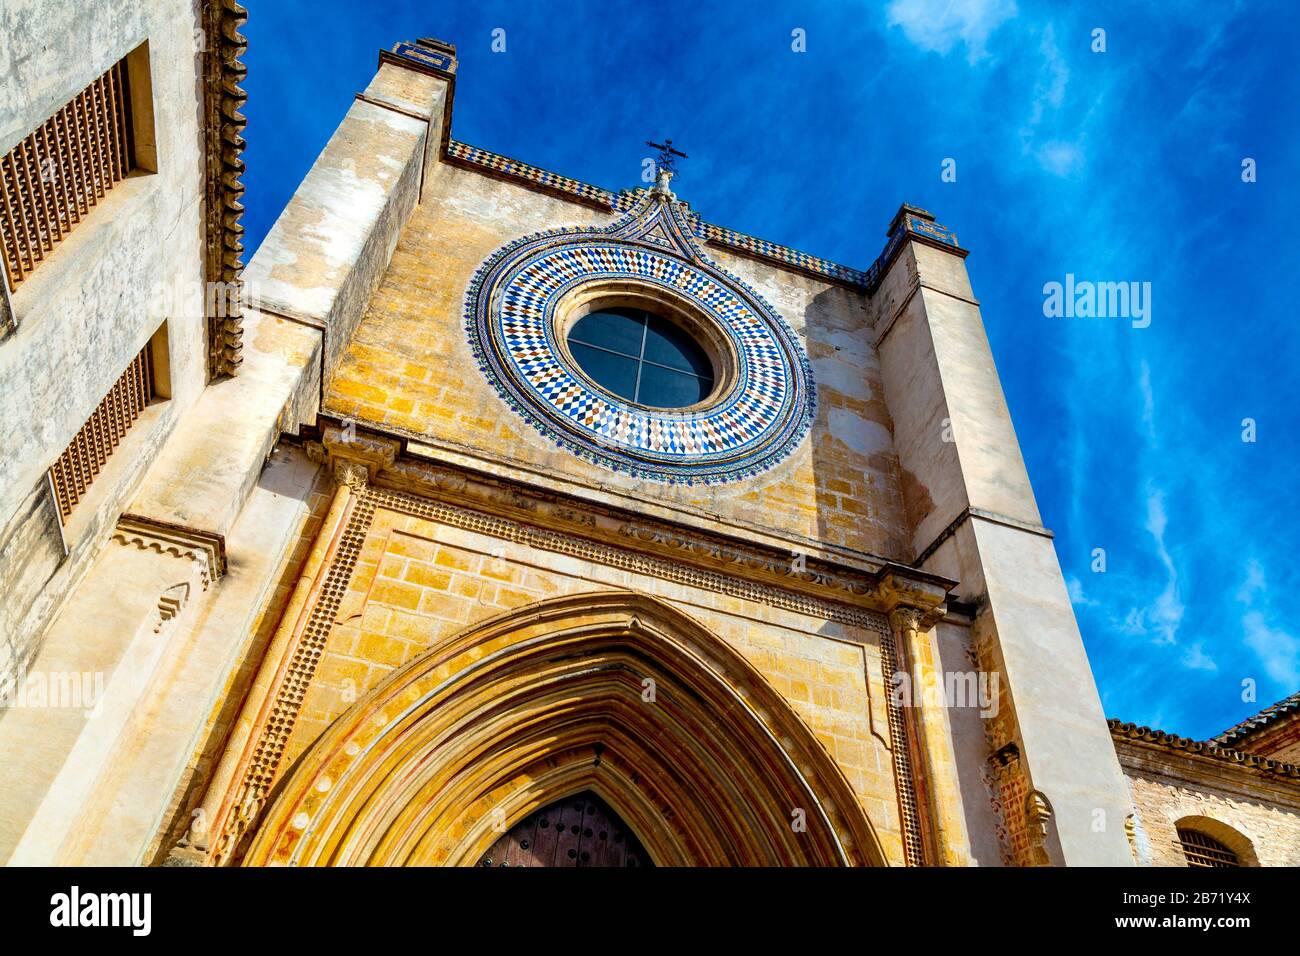 Andalusian Museum of Contemporary Art (Centro Andaluz de Arte Contemporáneo) in a former Monastery of Santa Maria de las Cuevas, Seville, Spain Stock Photo